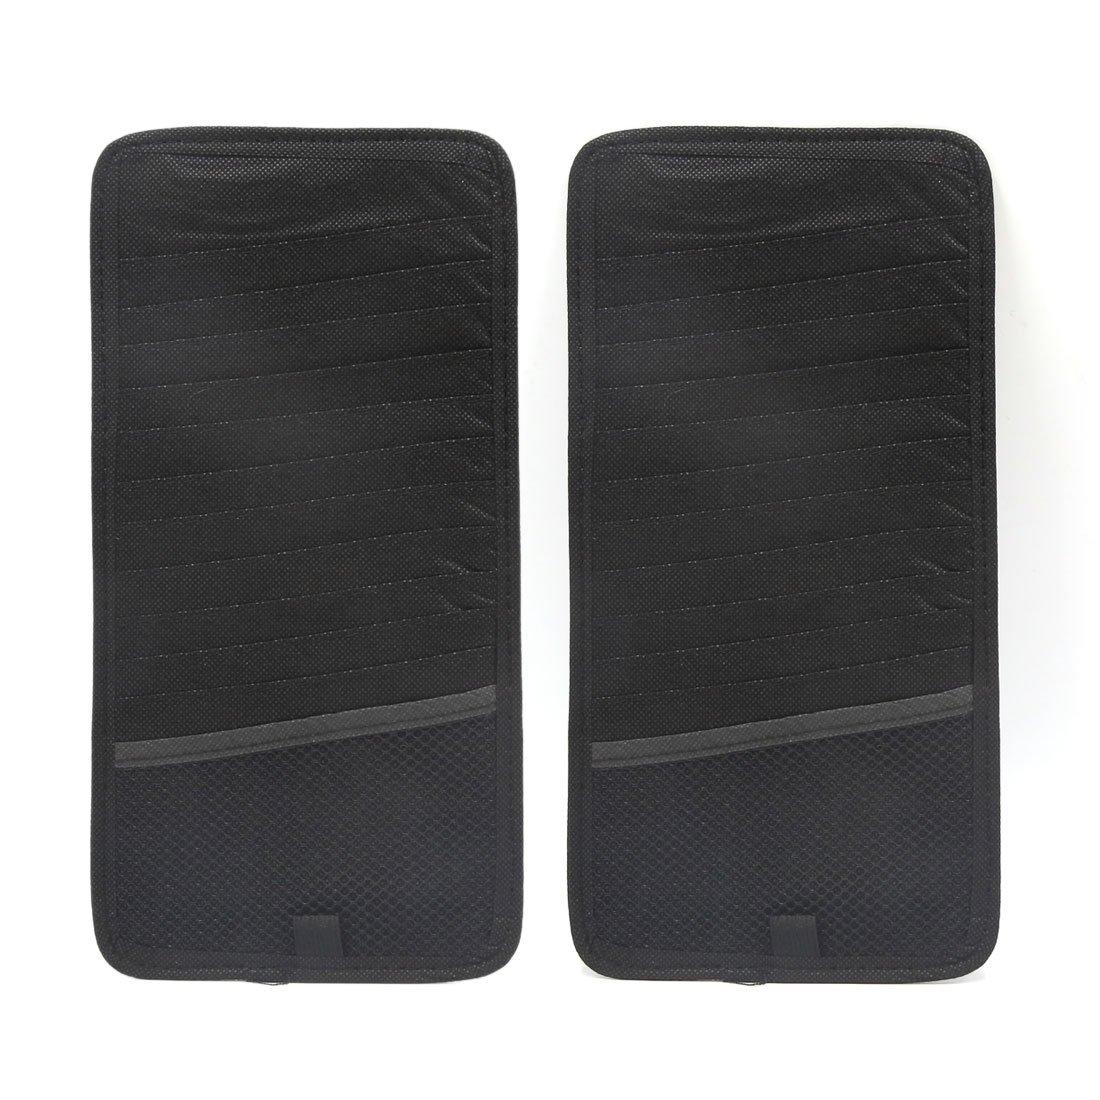 uxcell 2Pcs Black Rectangle Shaped Car CD DVD Sun Visor Card Storage Organizer Holder